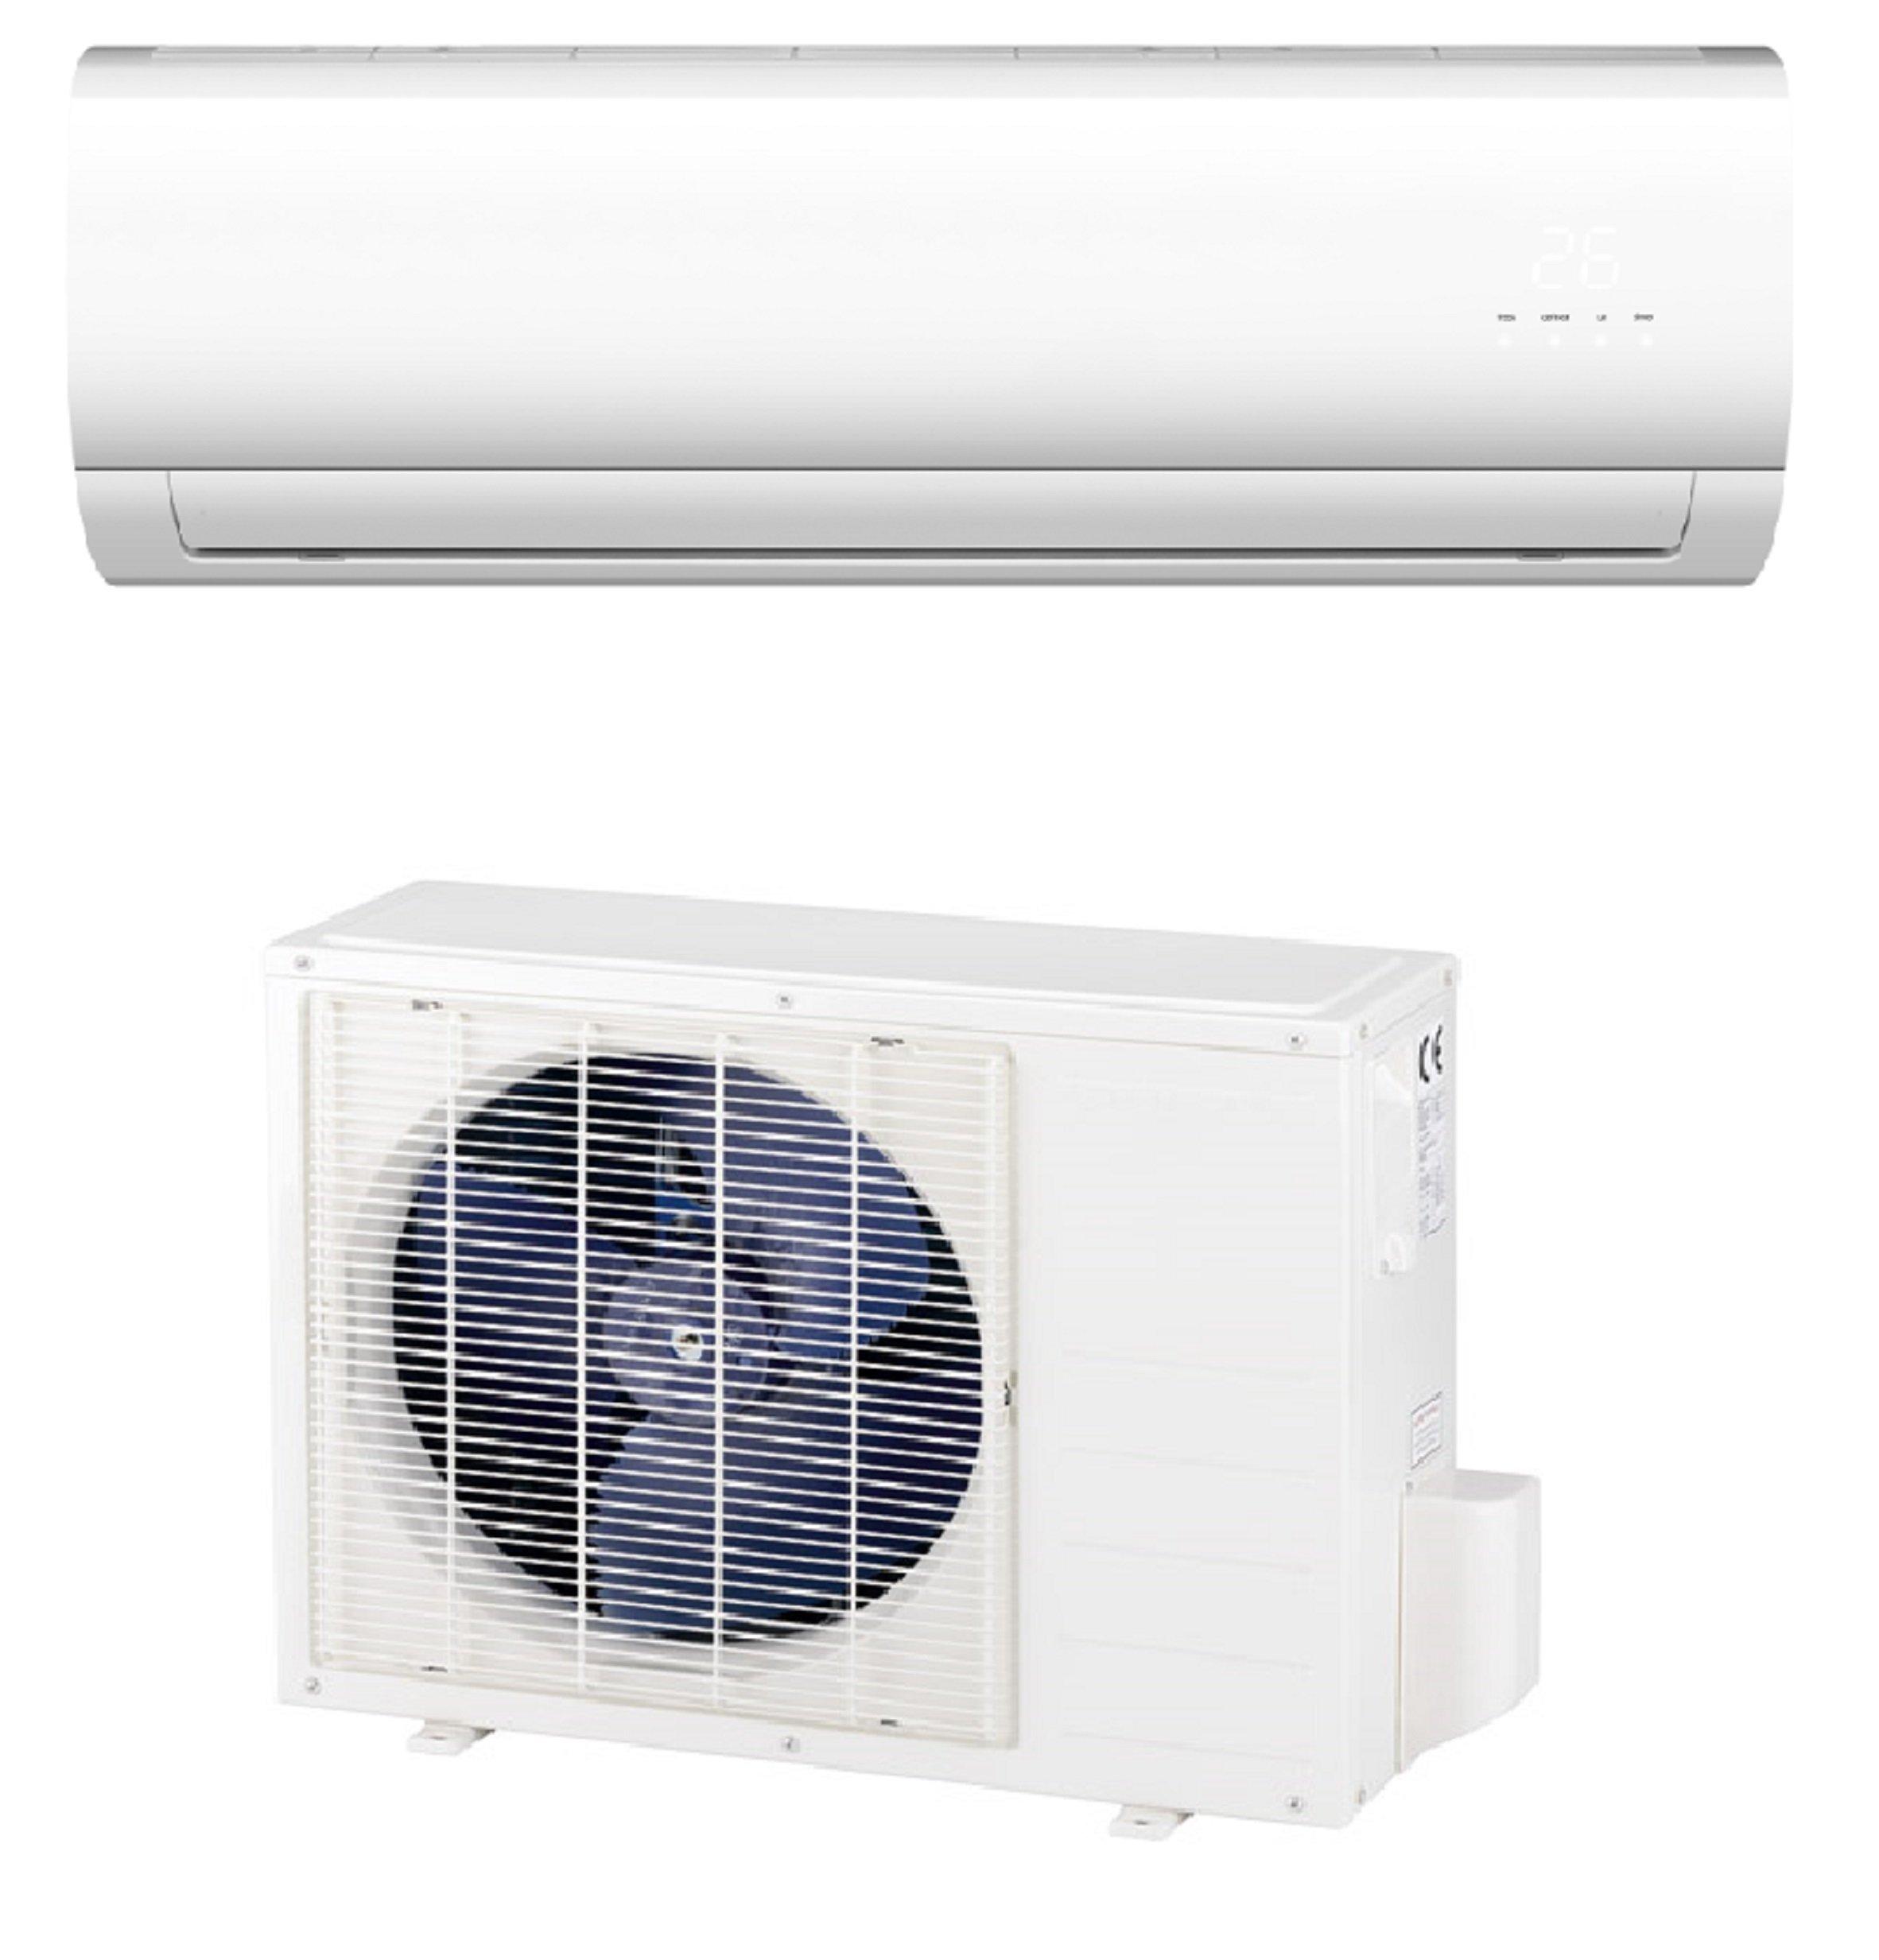 Comfee MSR23-18HRDN1-QE Inverter Split-Klimagerät mit Quick-Connector 16500 BTU inklusive Wärmepumpe, Raumgröße bis 60 m² , EEK: A+ product image